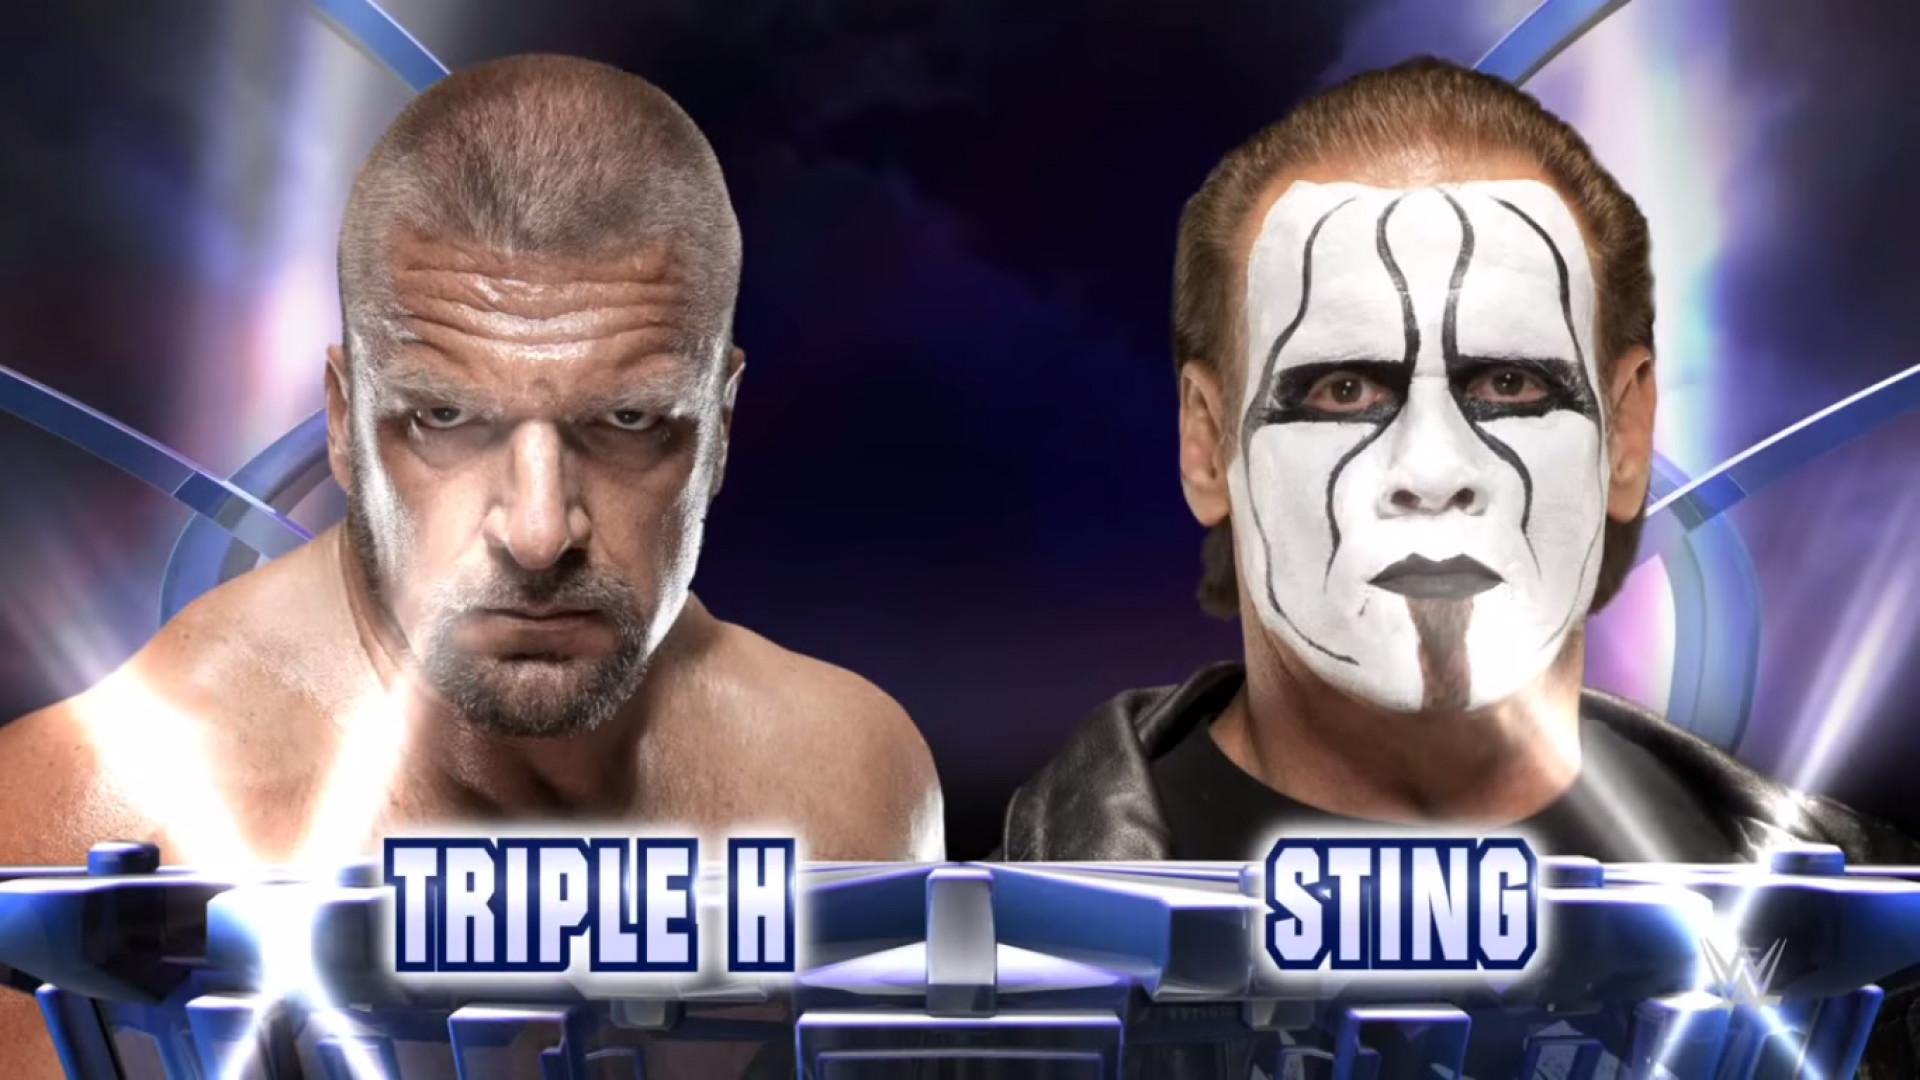 Wrestling wallpapers